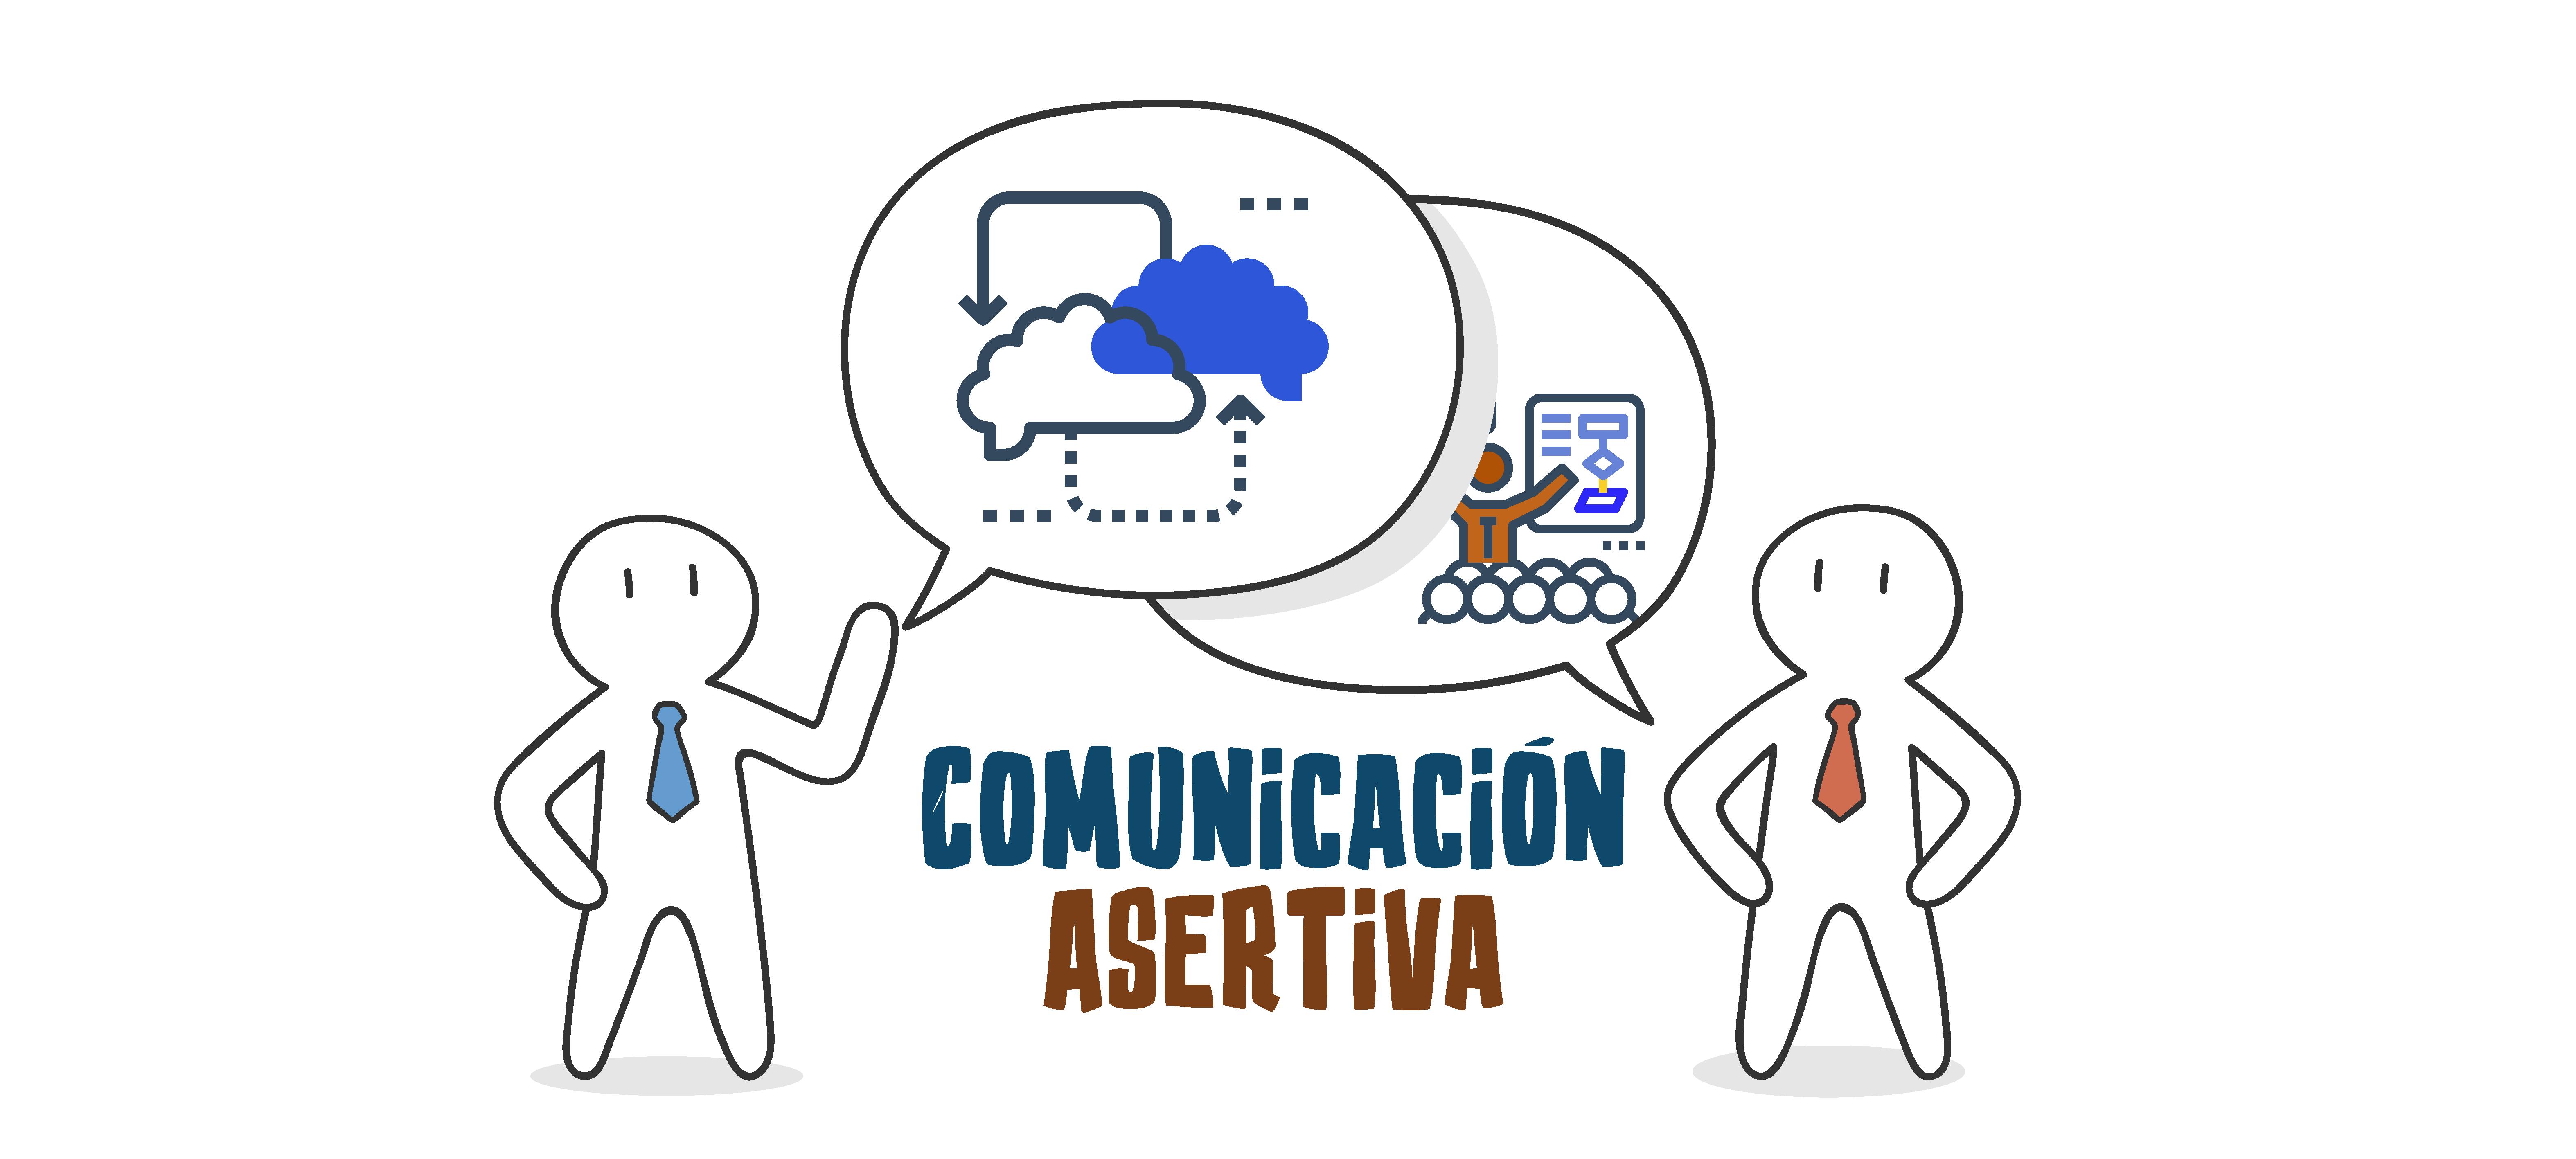 Comunicación Asertiva: Regional